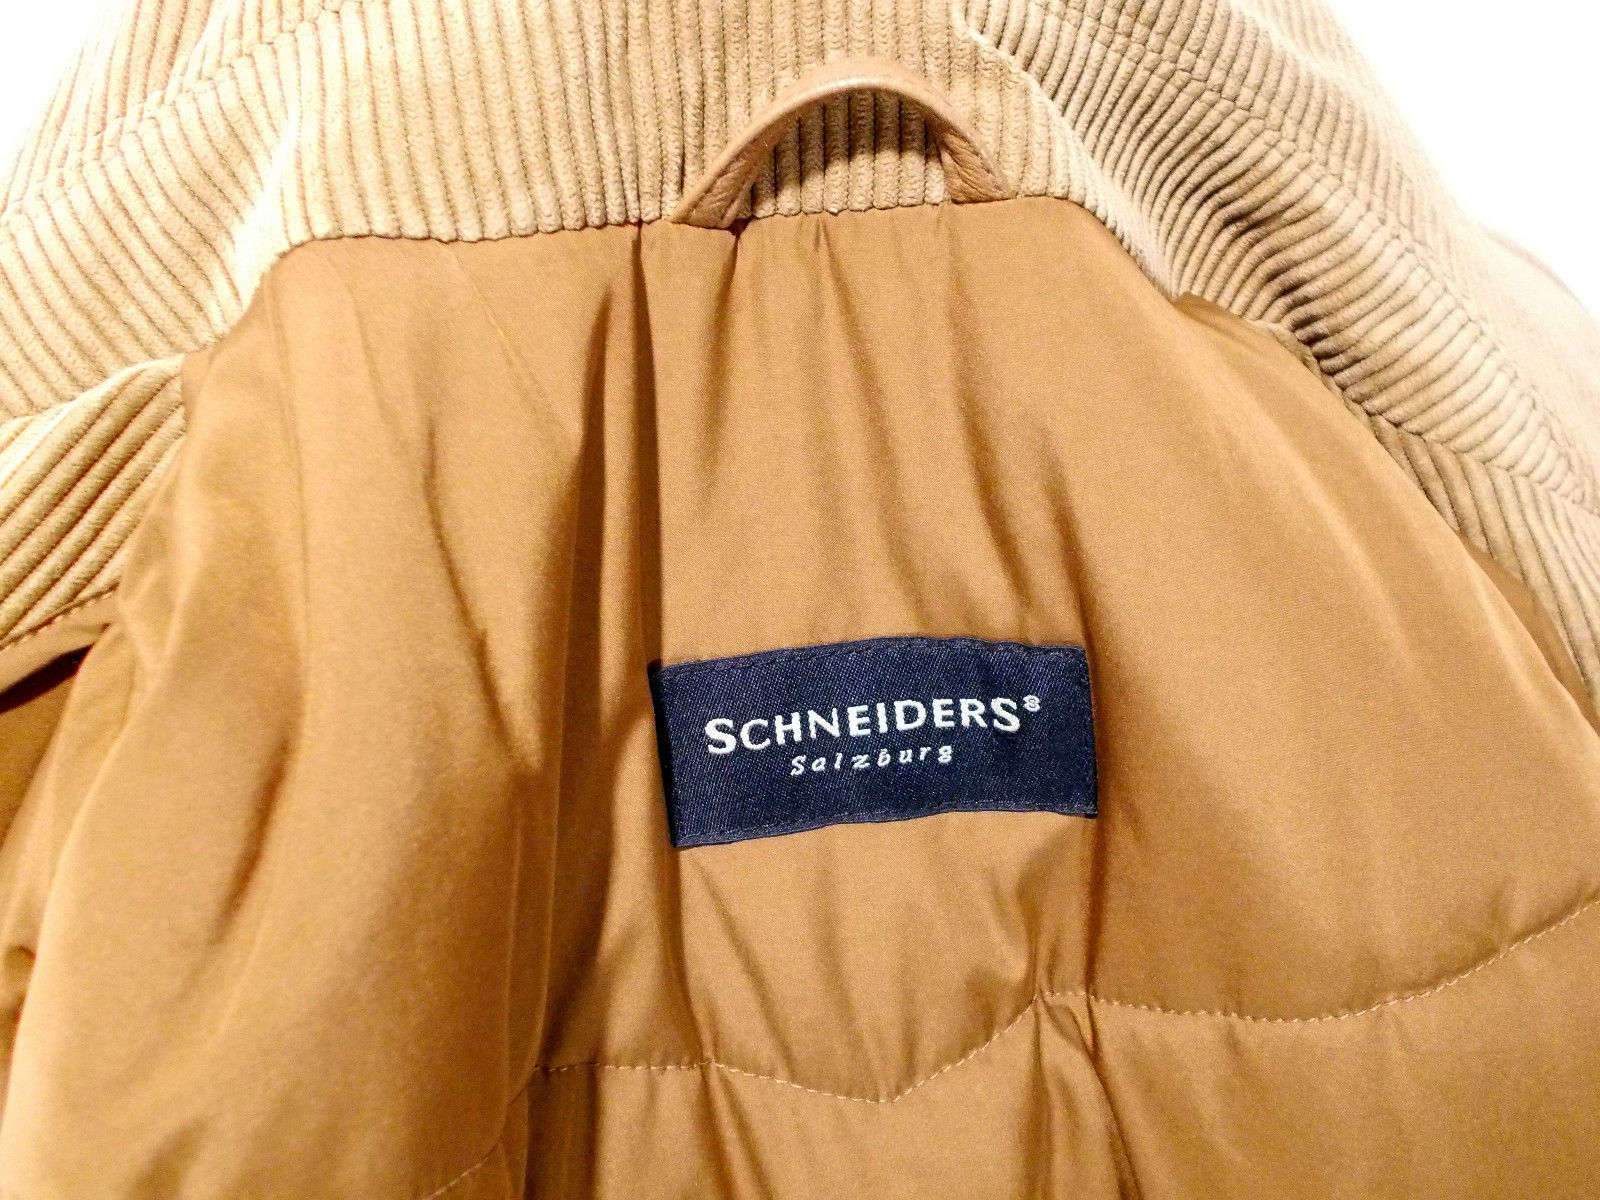 SCHNEIDERS caban uomo GIACCA giaccone VELLUTO jacket BEIGE tg. 48(IT ... 0055ec354f6